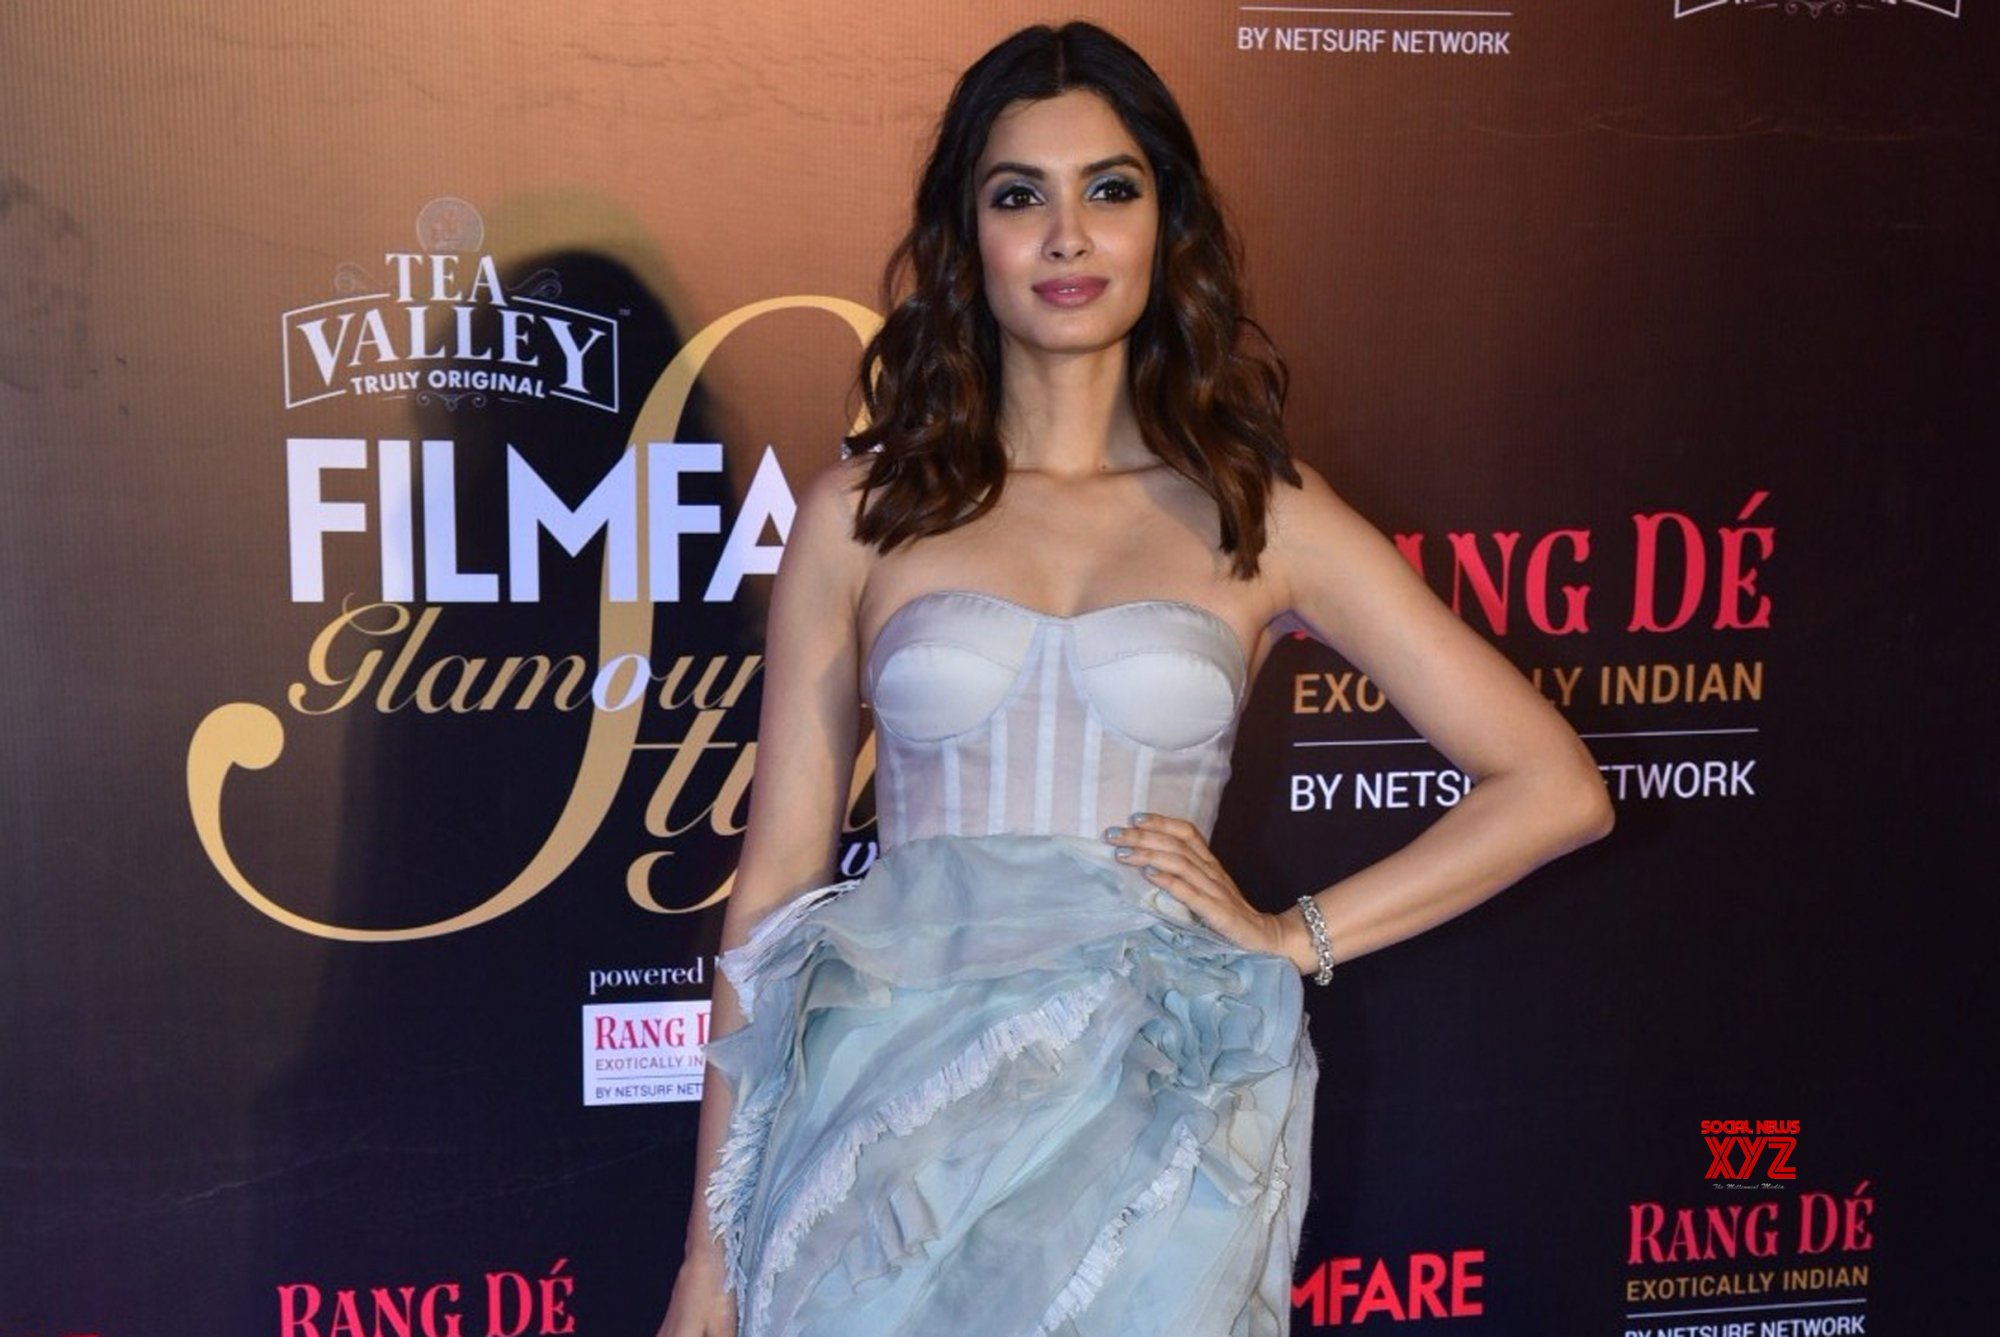 Mumbai: Filmfare Glamour And Style Awards 2019 - Diana Penty #Gallery